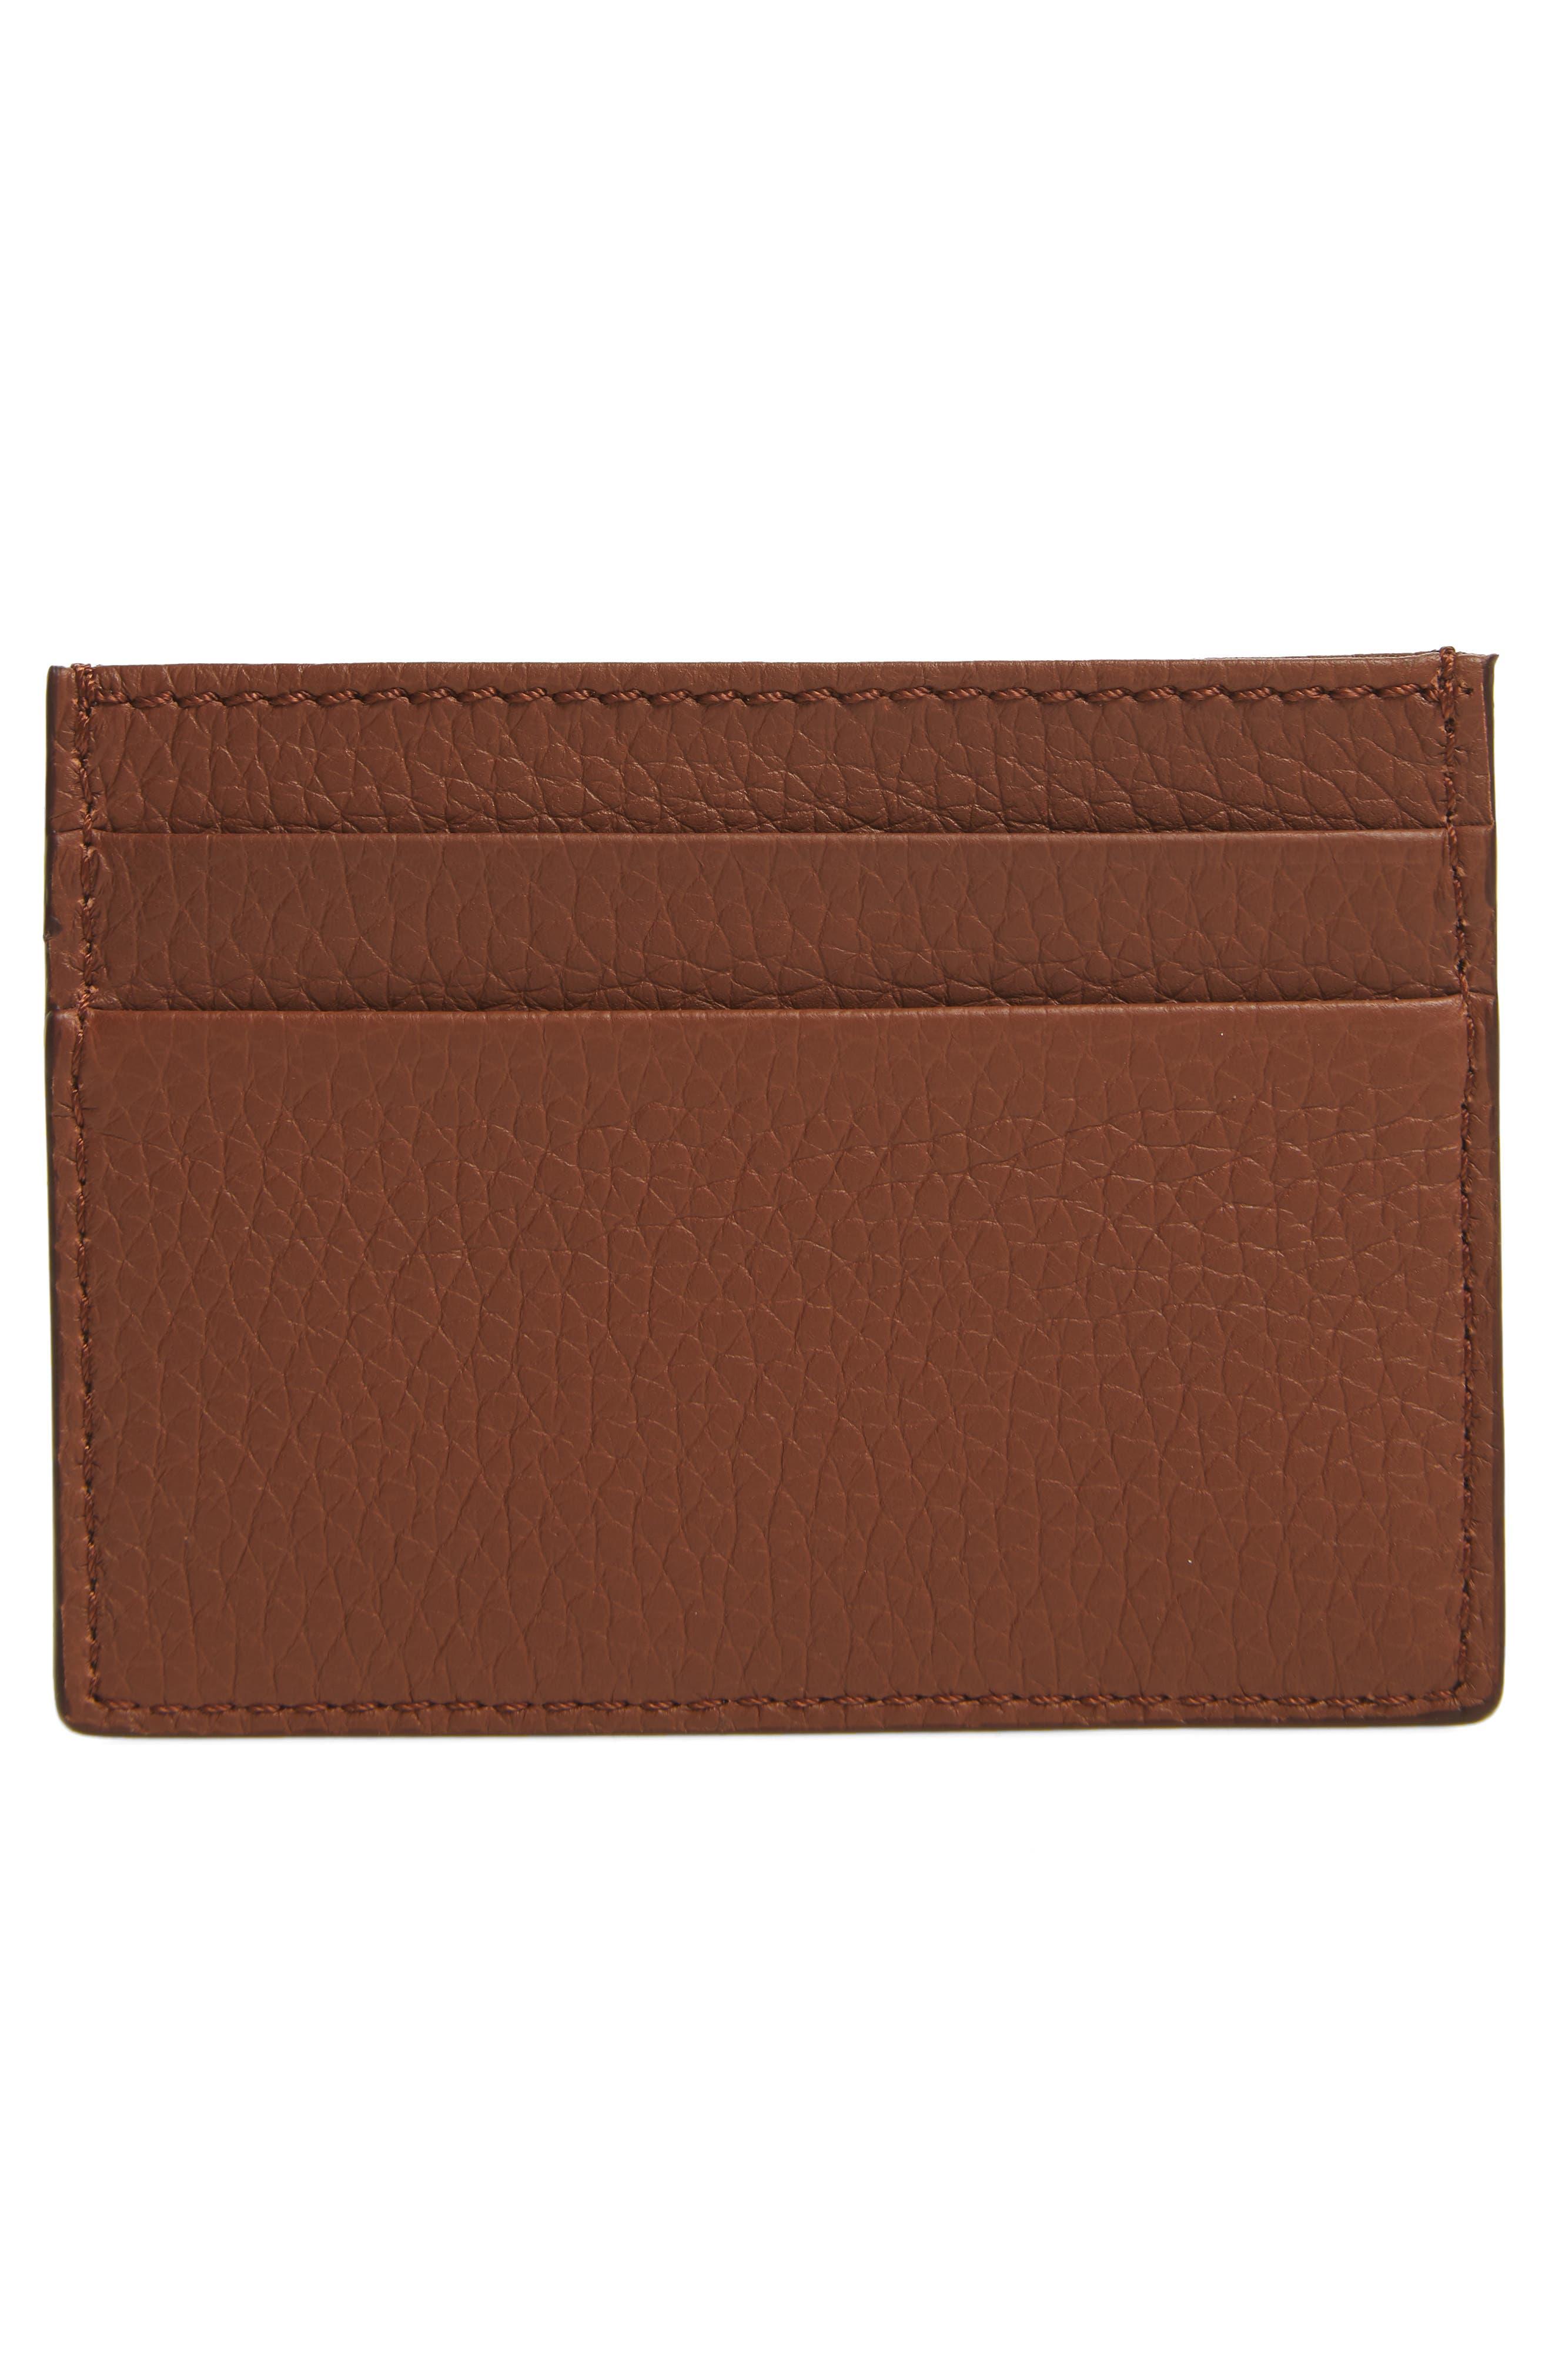 Sandon Leather Card Case,                             Alternate thumbnail 2, color,                             Chestnut Brown